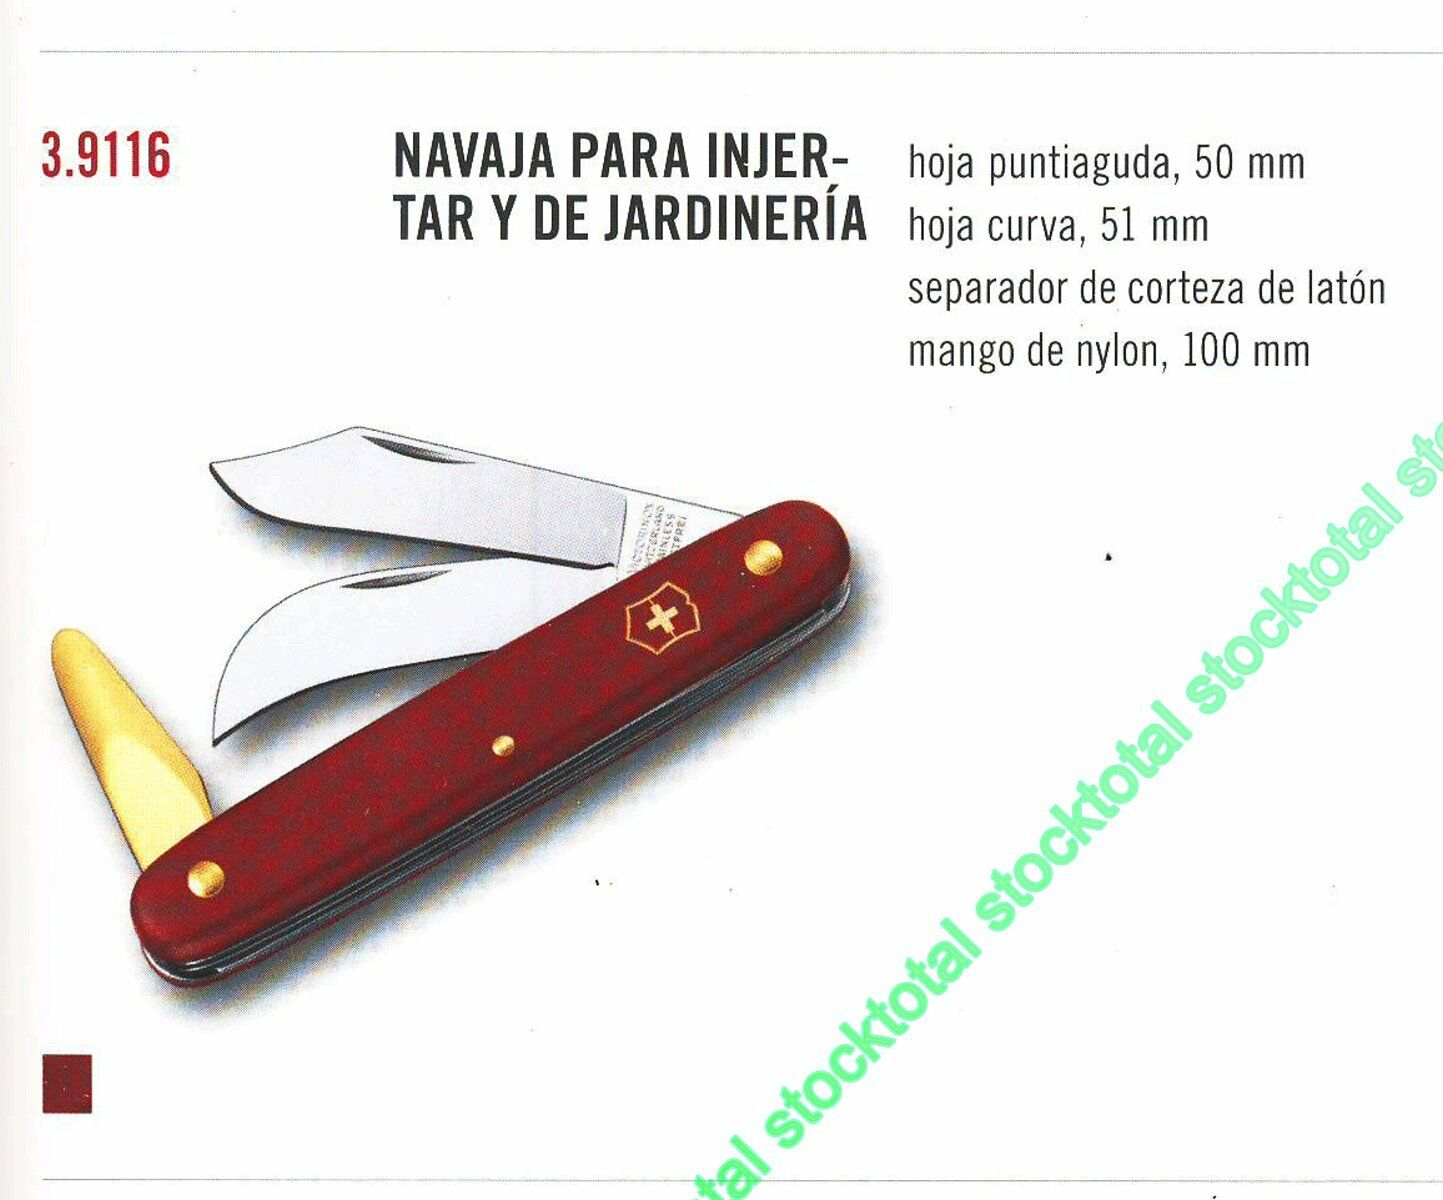 NAVAJA VICTORINOX PARA INJERTAR Y JARDINERIA 39116 3.9116